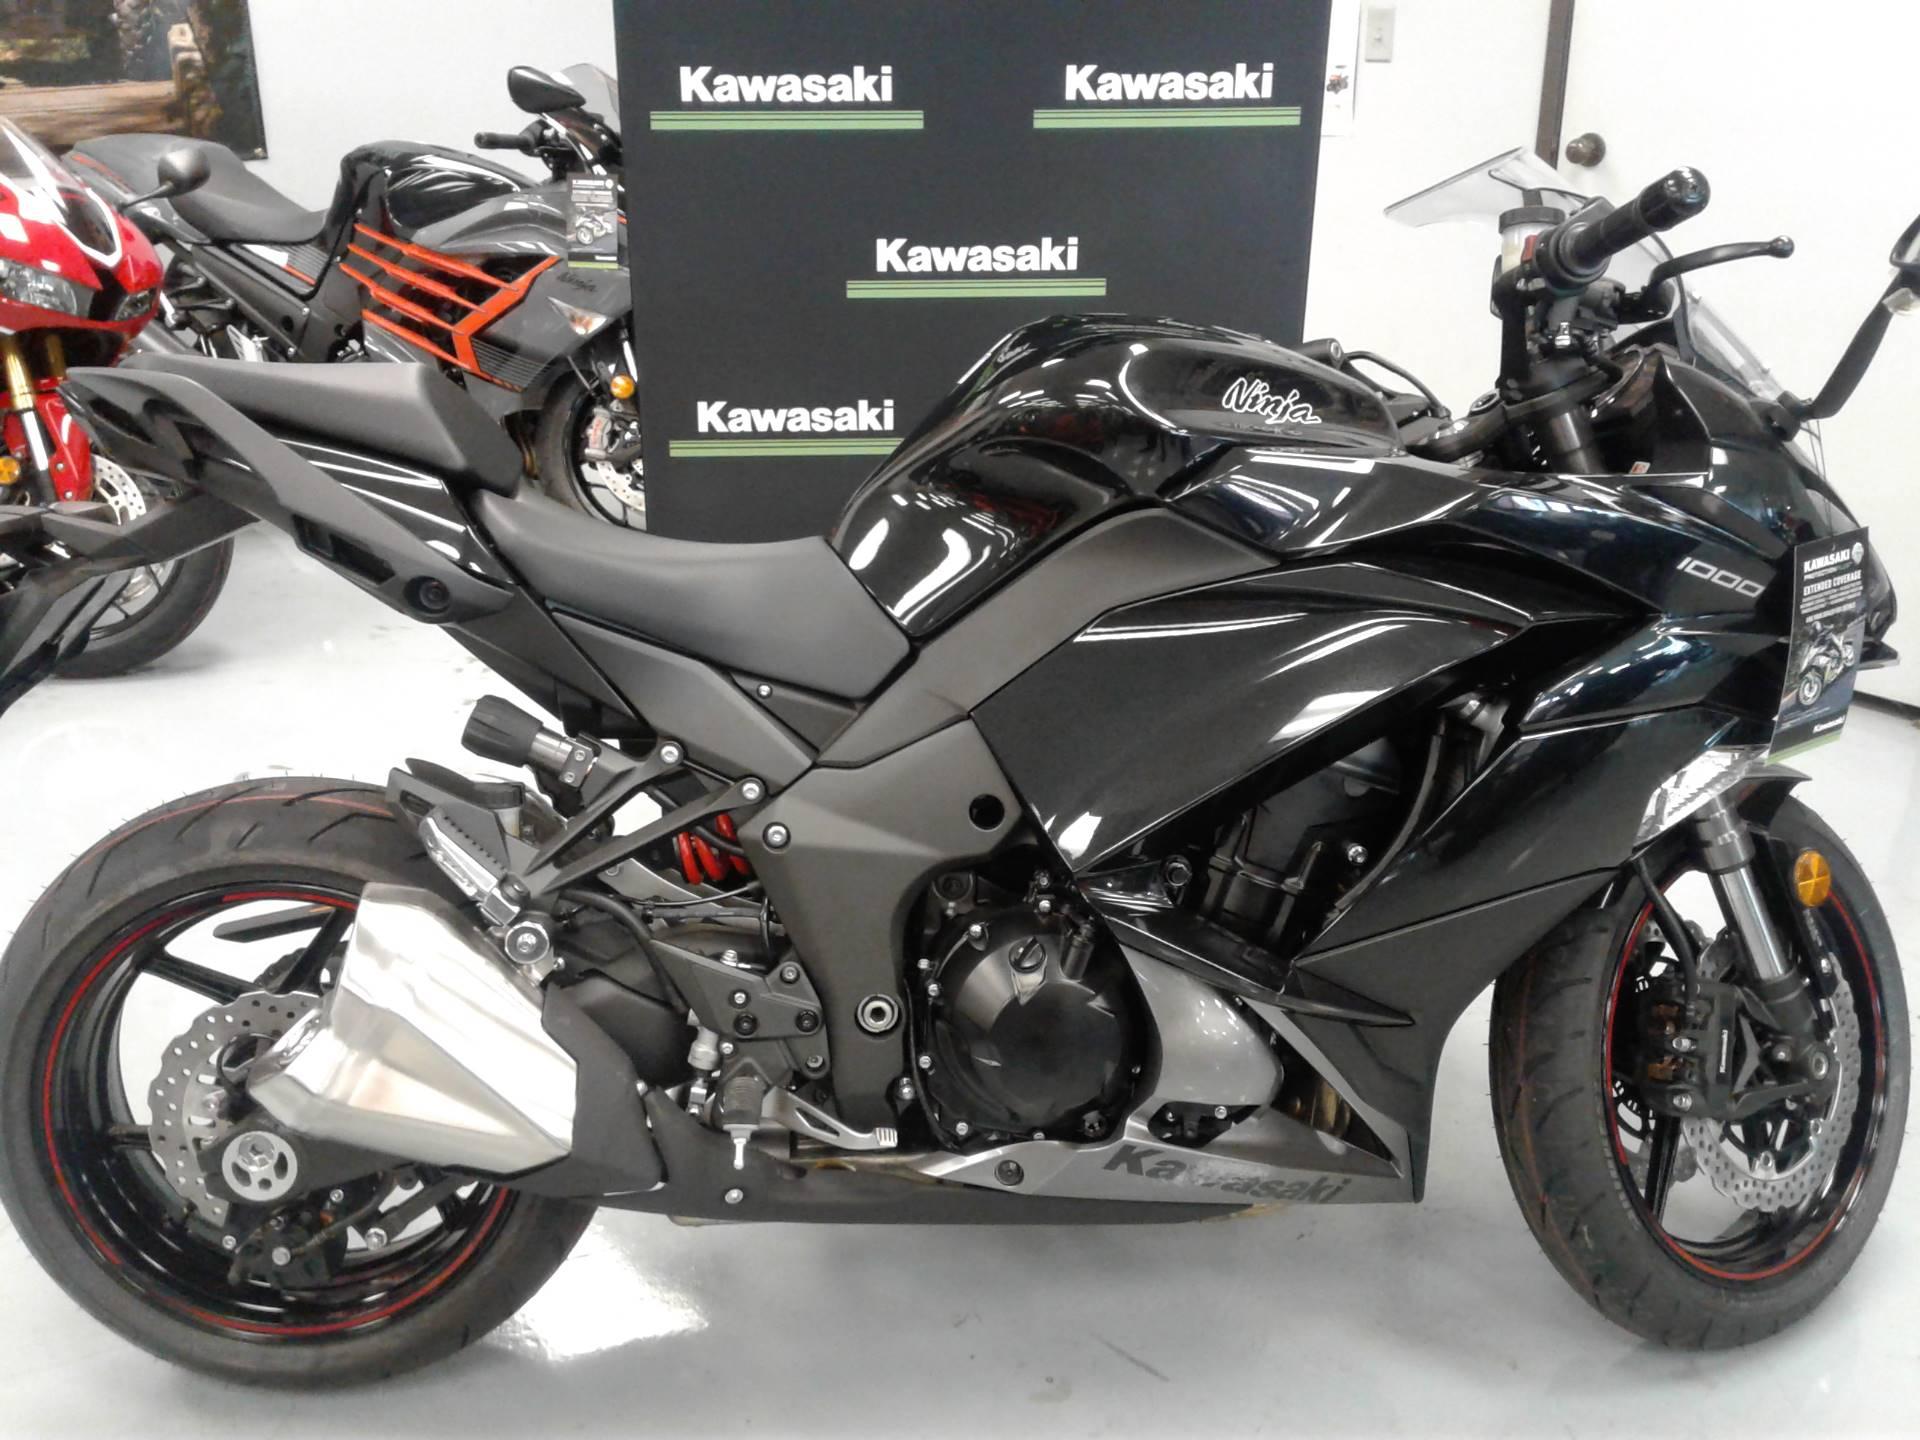 new 2018 kawasaki ninja 1000 abs motorcycles in orange ca stock number 12021m. Black Bedroom Furniture Sets. Home Design Ideas